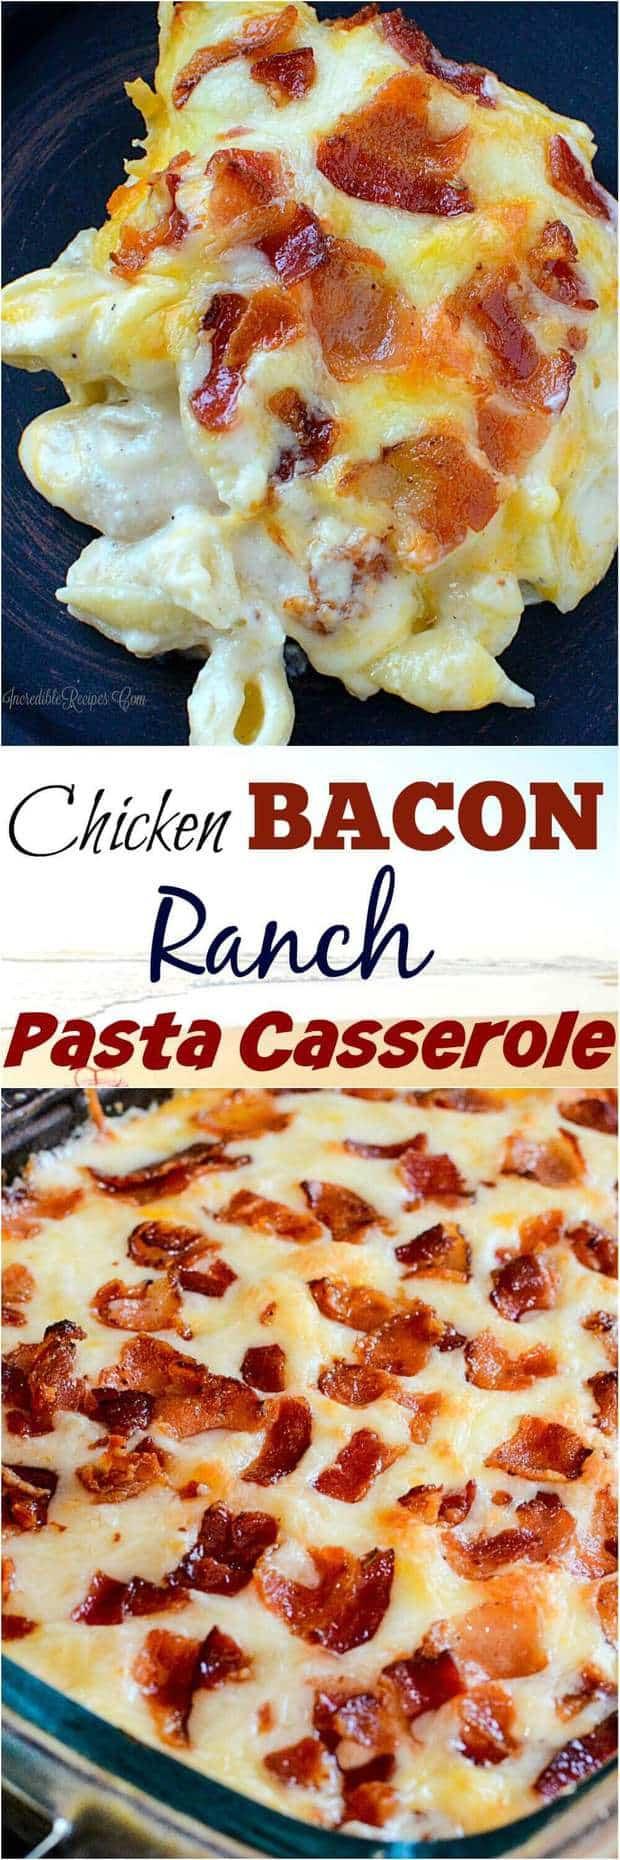 Healthy Chicken Fajita Casserole  Easy Chicken Fajita Casserole The Best Blog Recipes